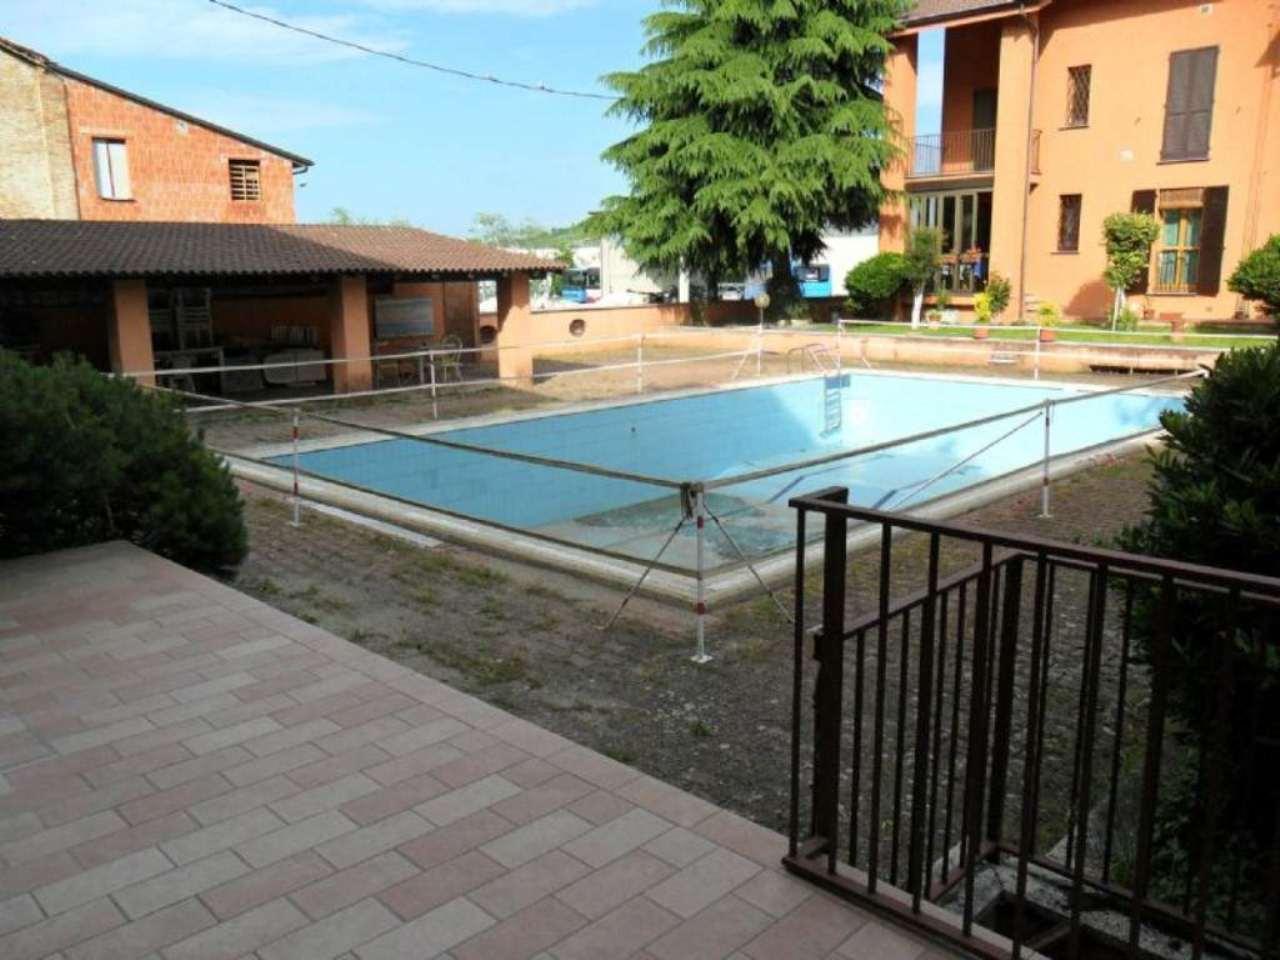 Bilocale Lugagnano Val d Arda Via Piacenza 6